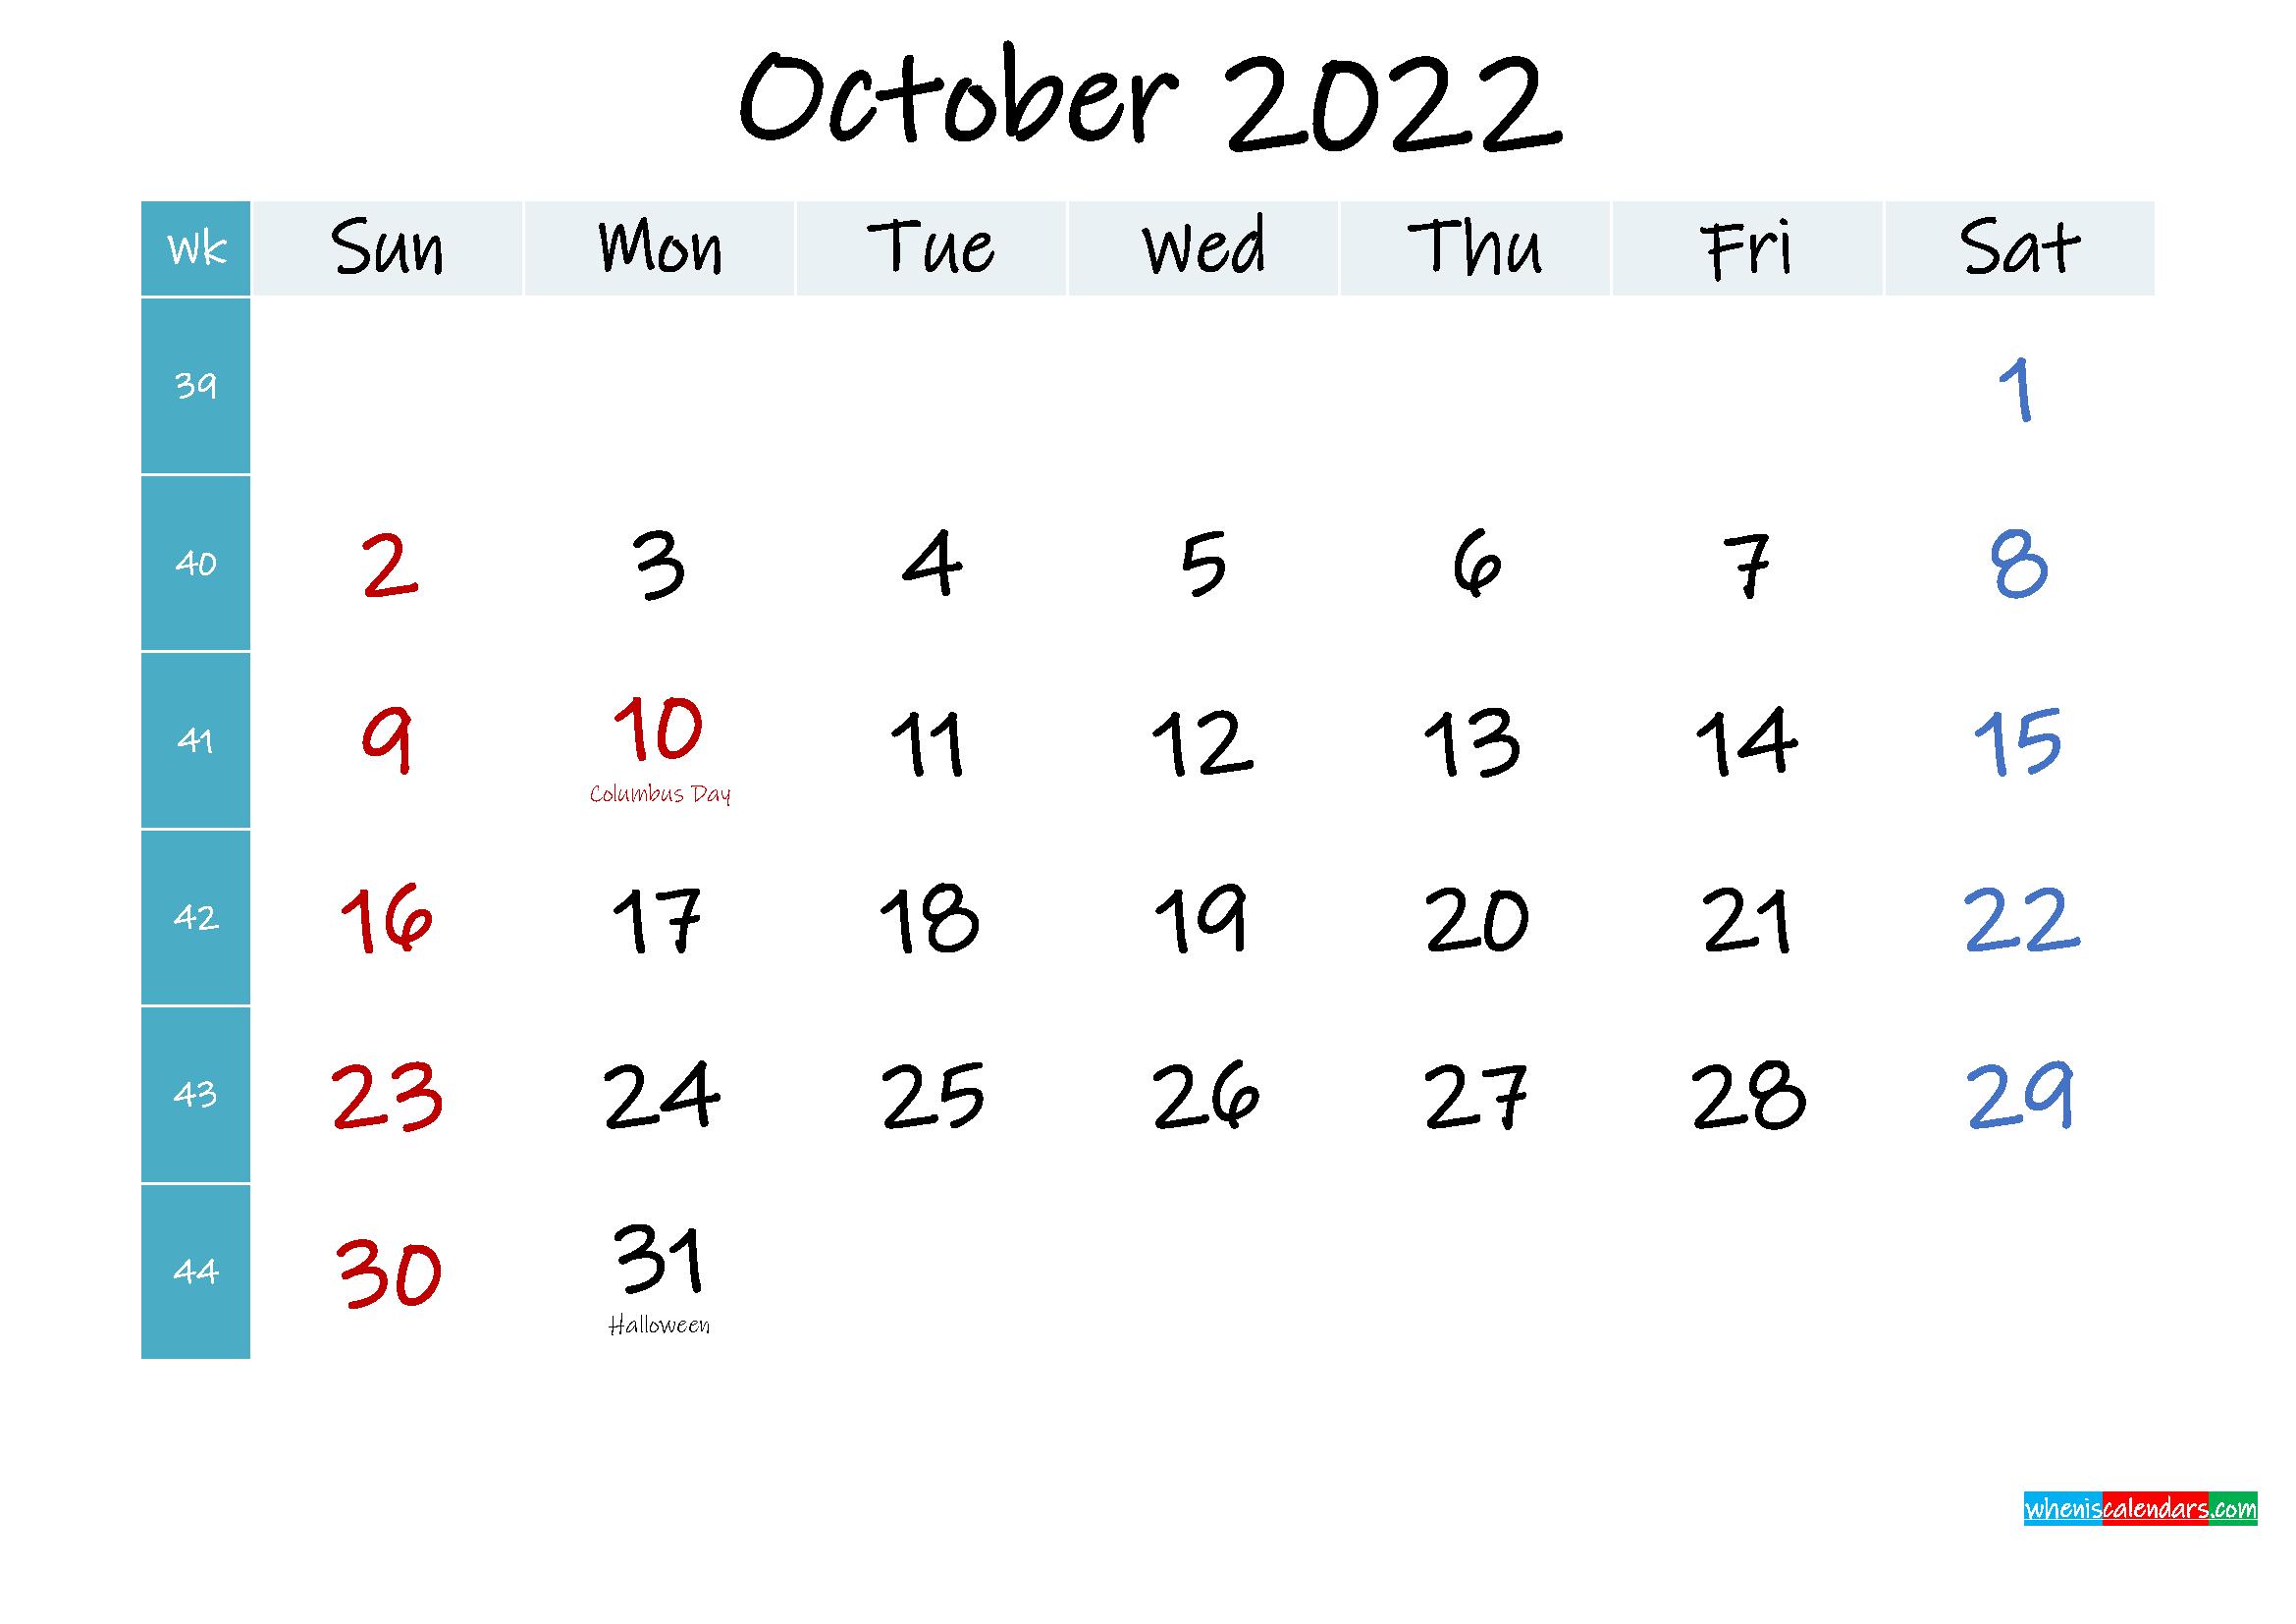 October 2022 Free Printable Calendar